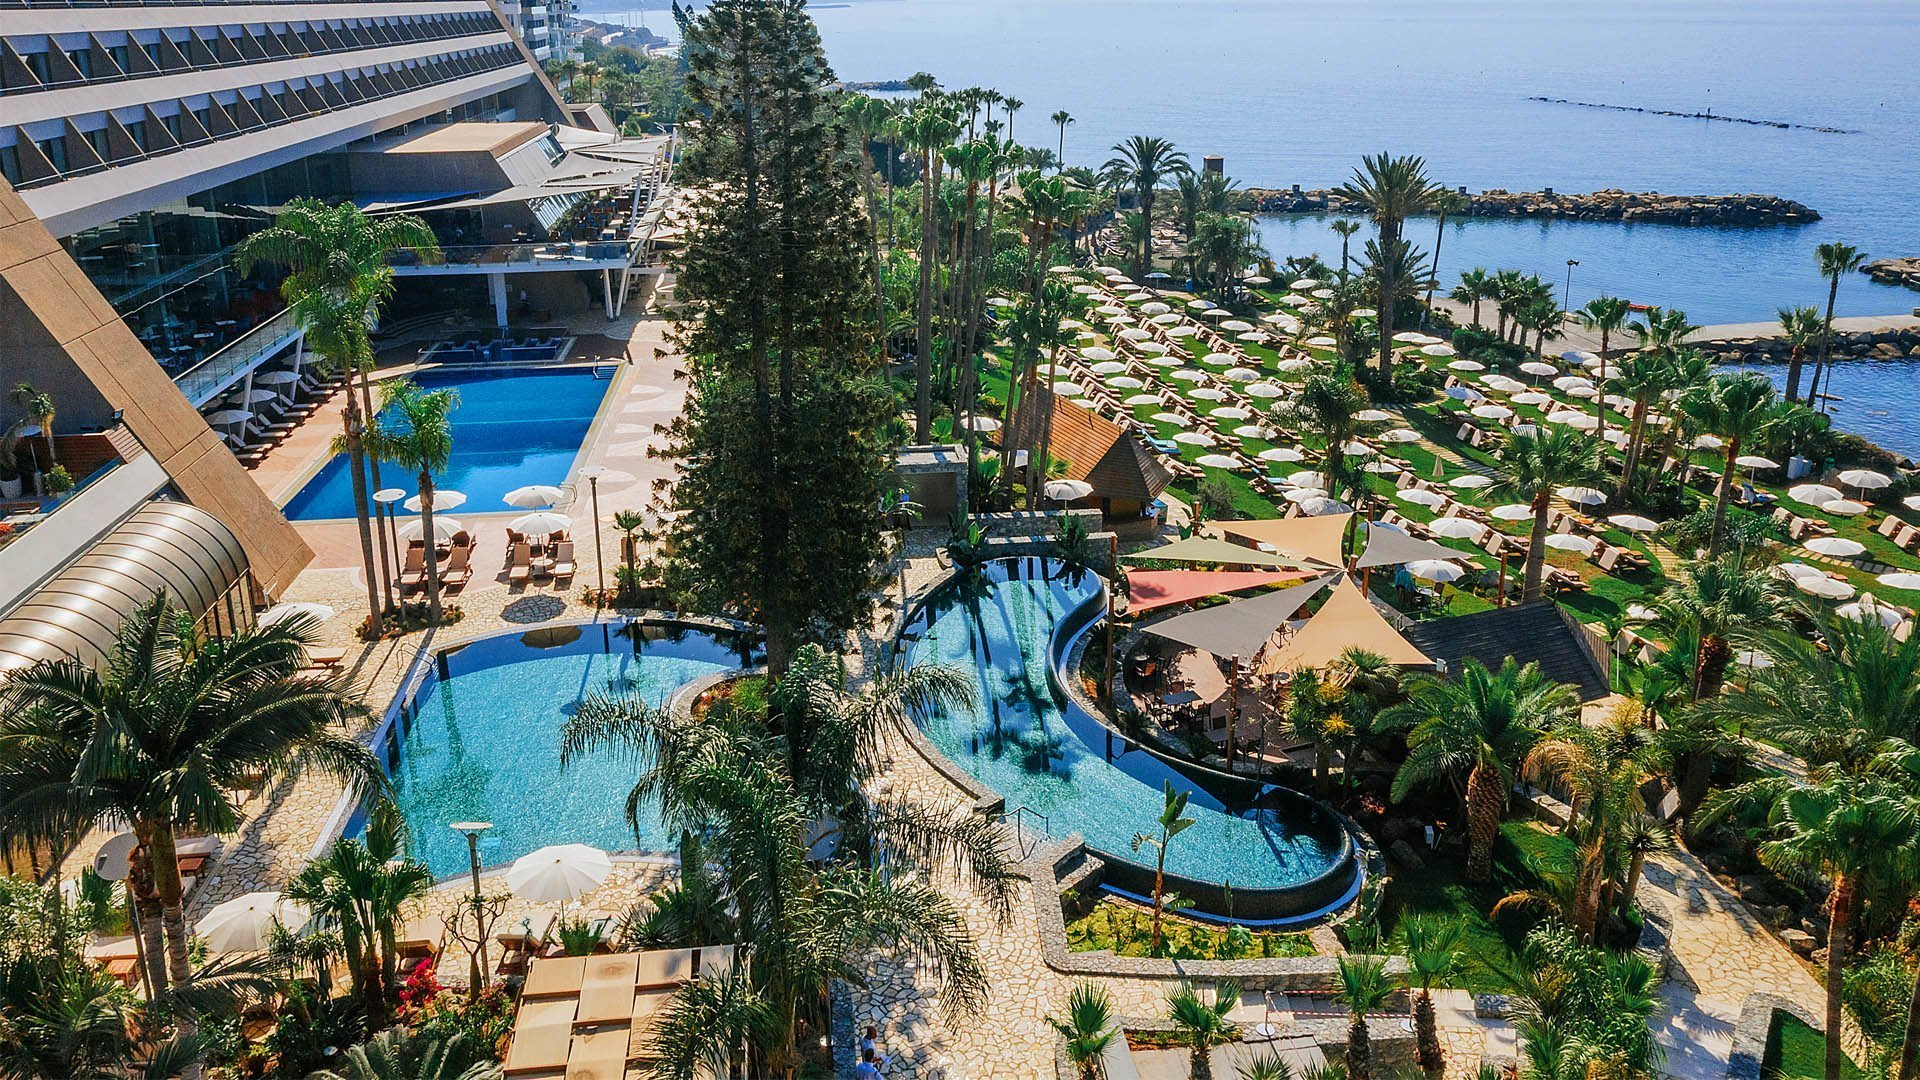 Amathus Beach Hotel-Limassol-Jumbo Travel-overivew